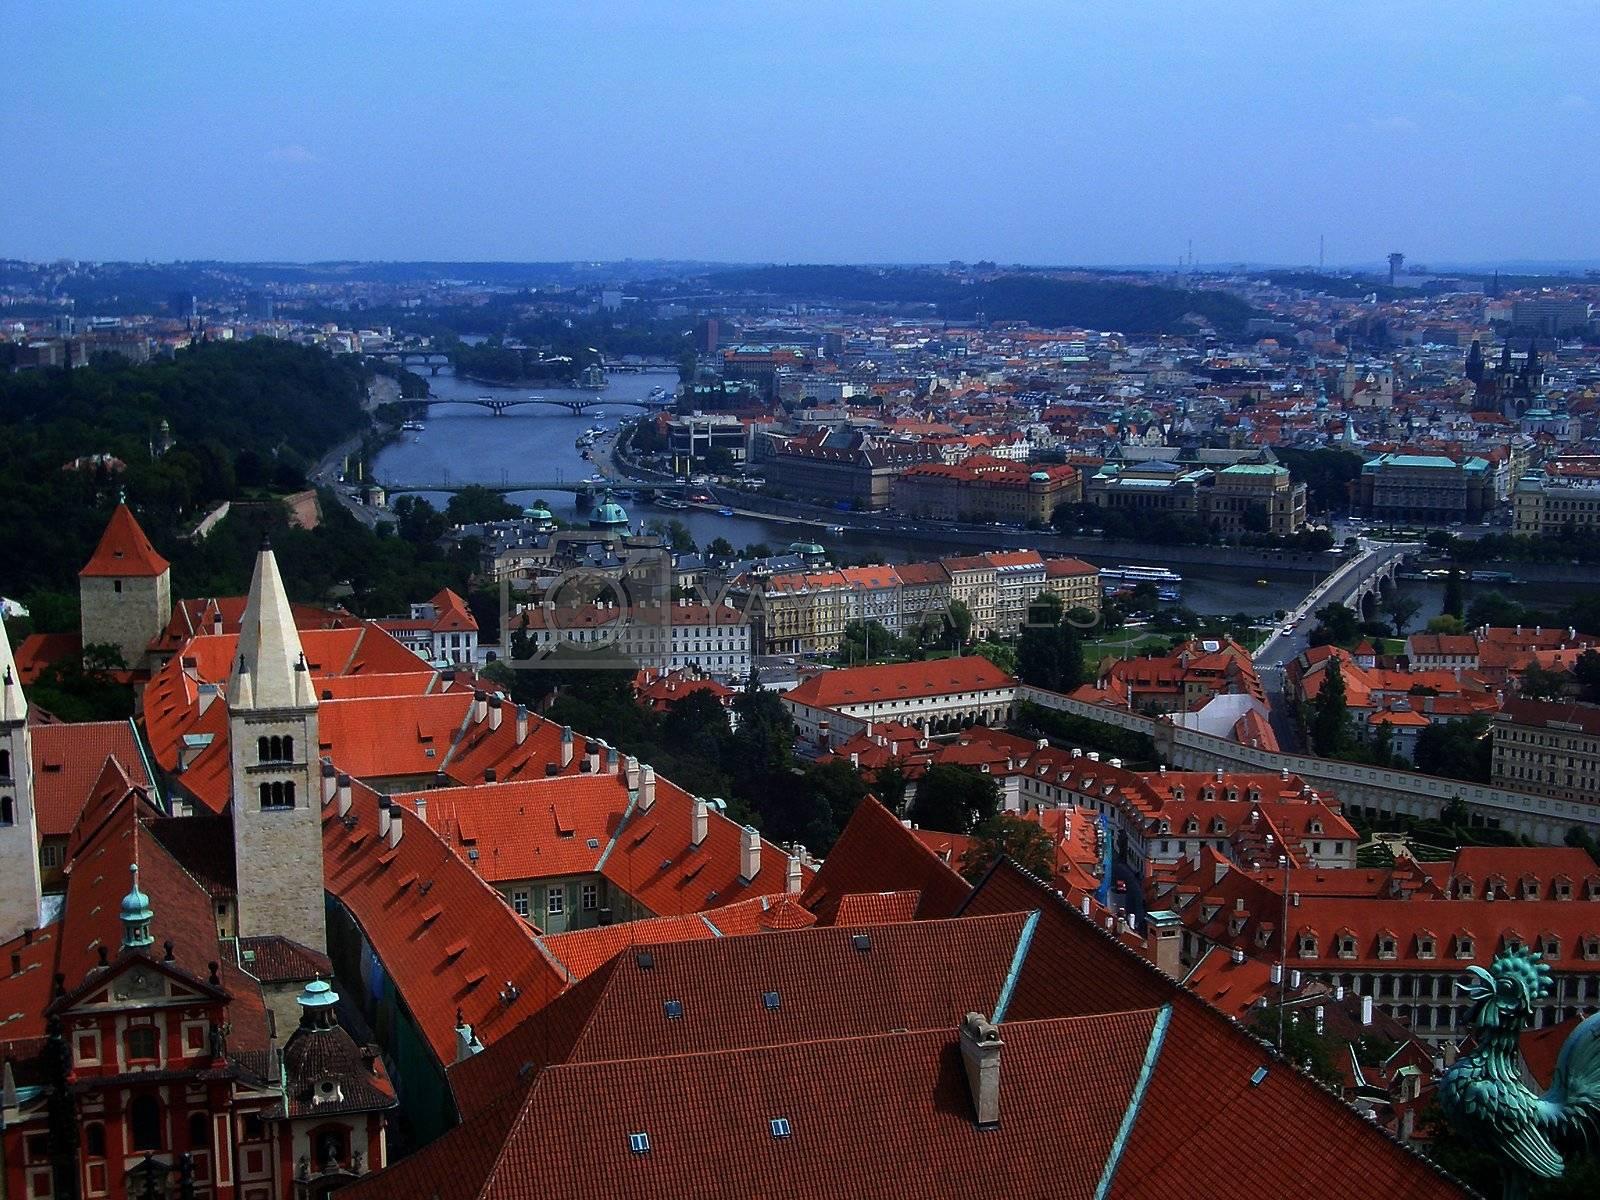 Panoramic view of Prague and city bridges, Czech Republic by Marco Rubino